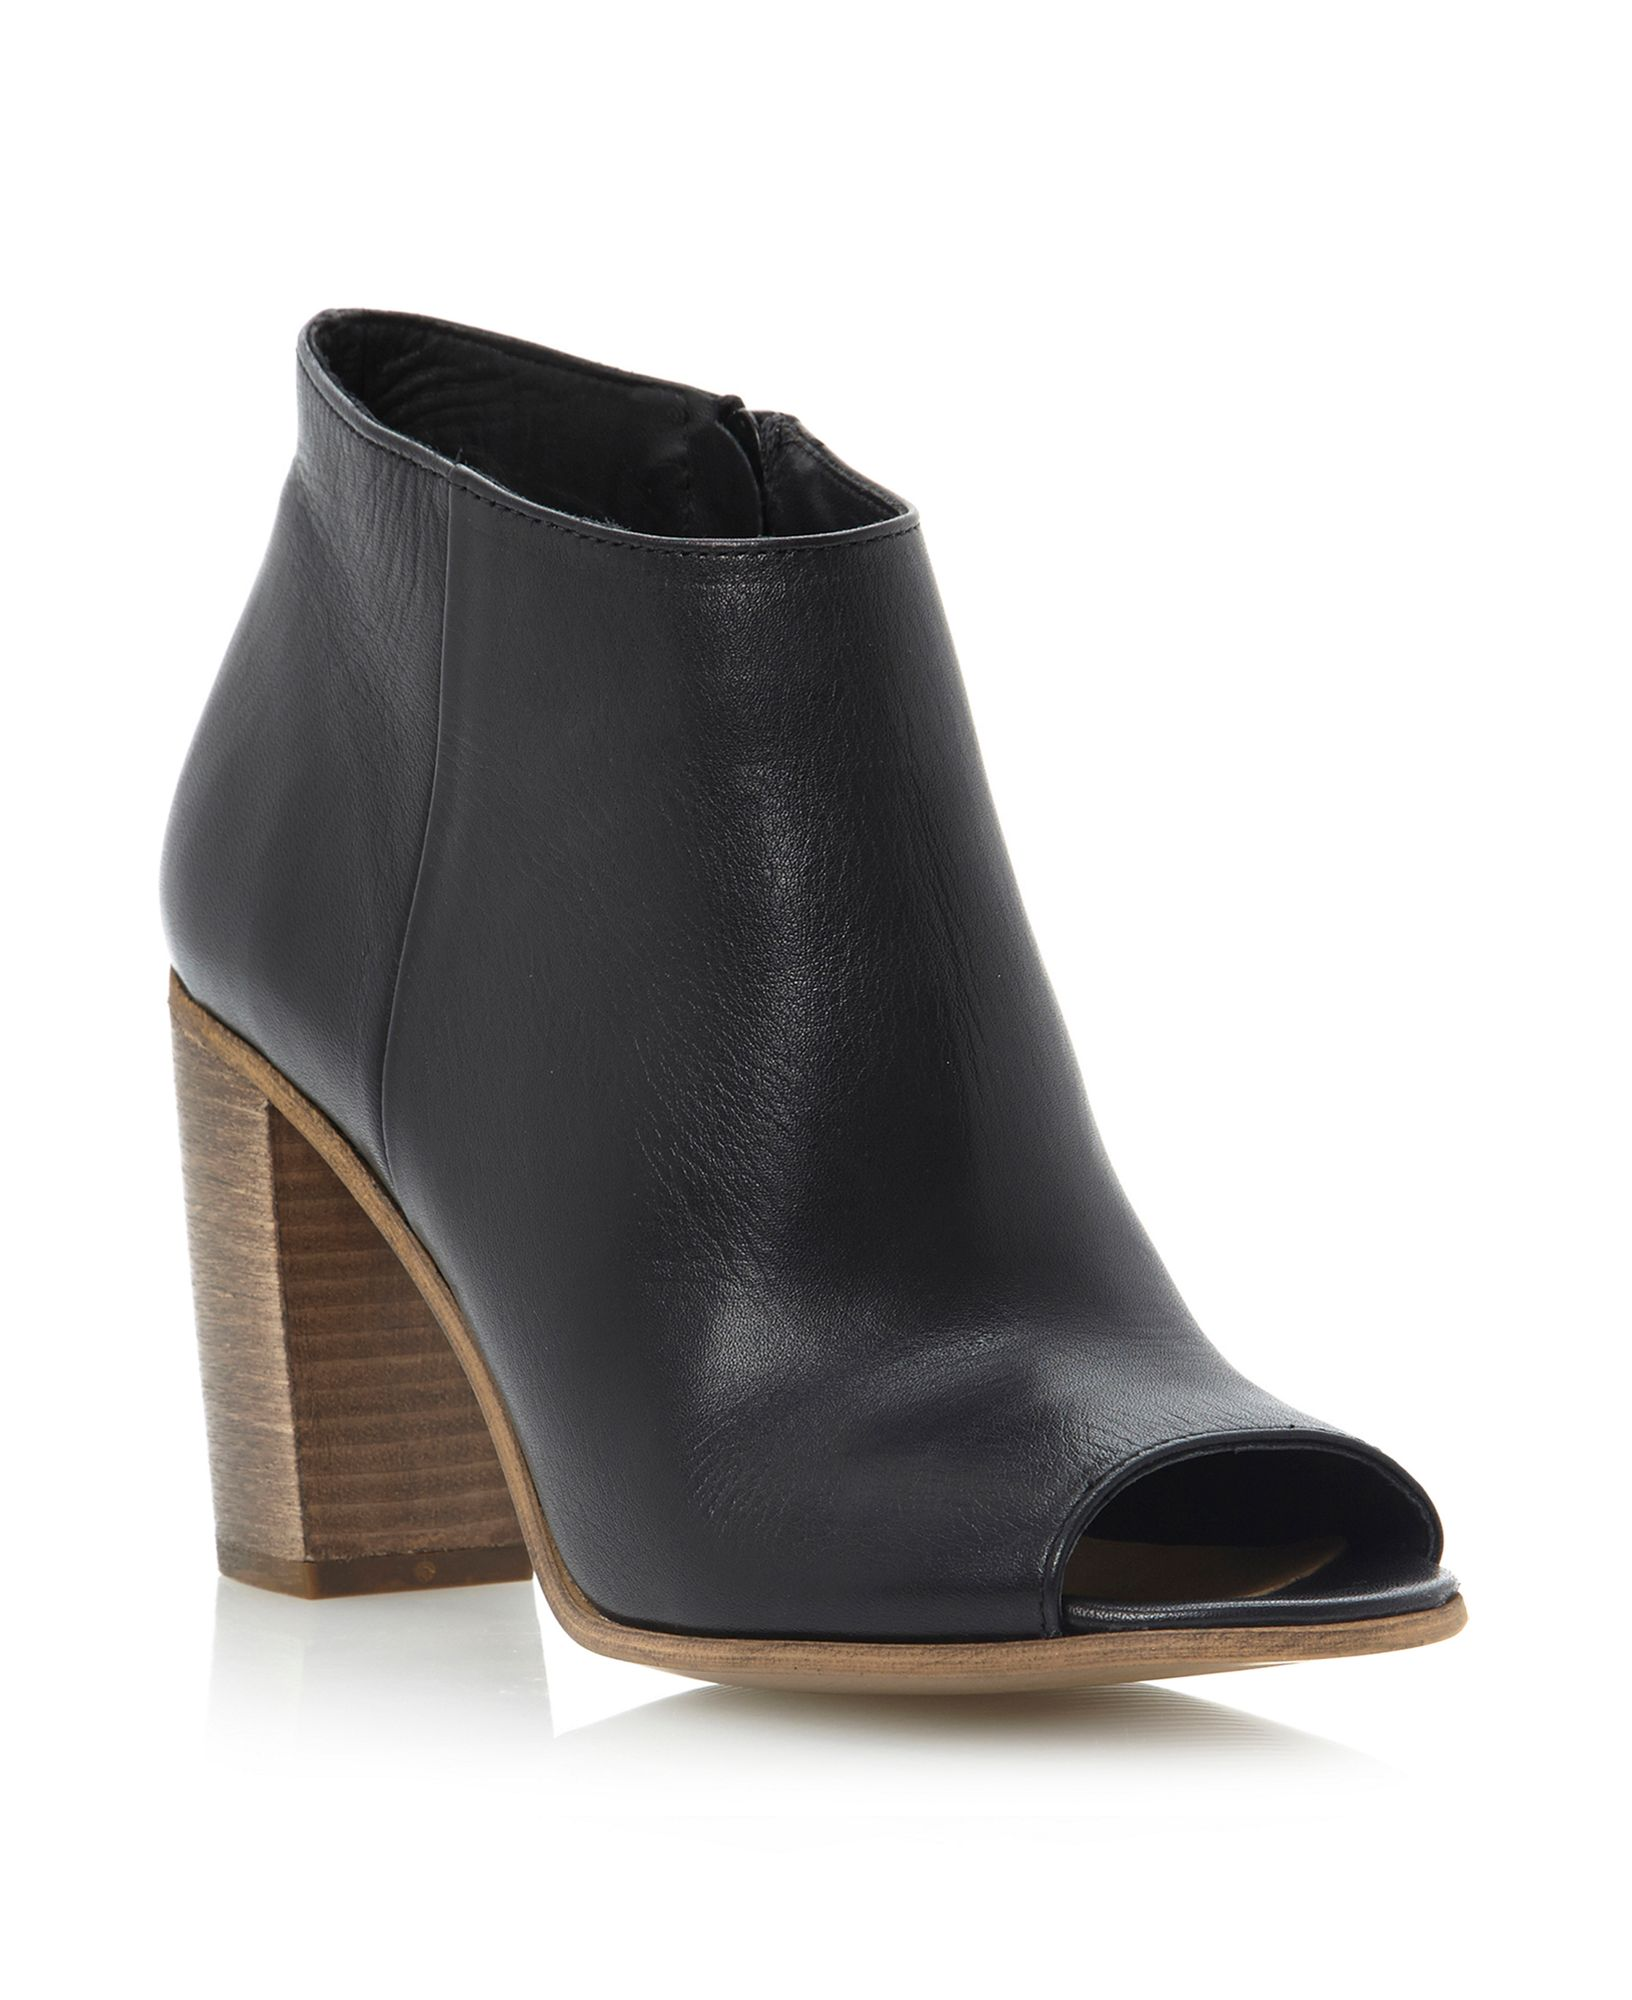 Dune Peek Peep Toe Boots in Black Leather (Black)